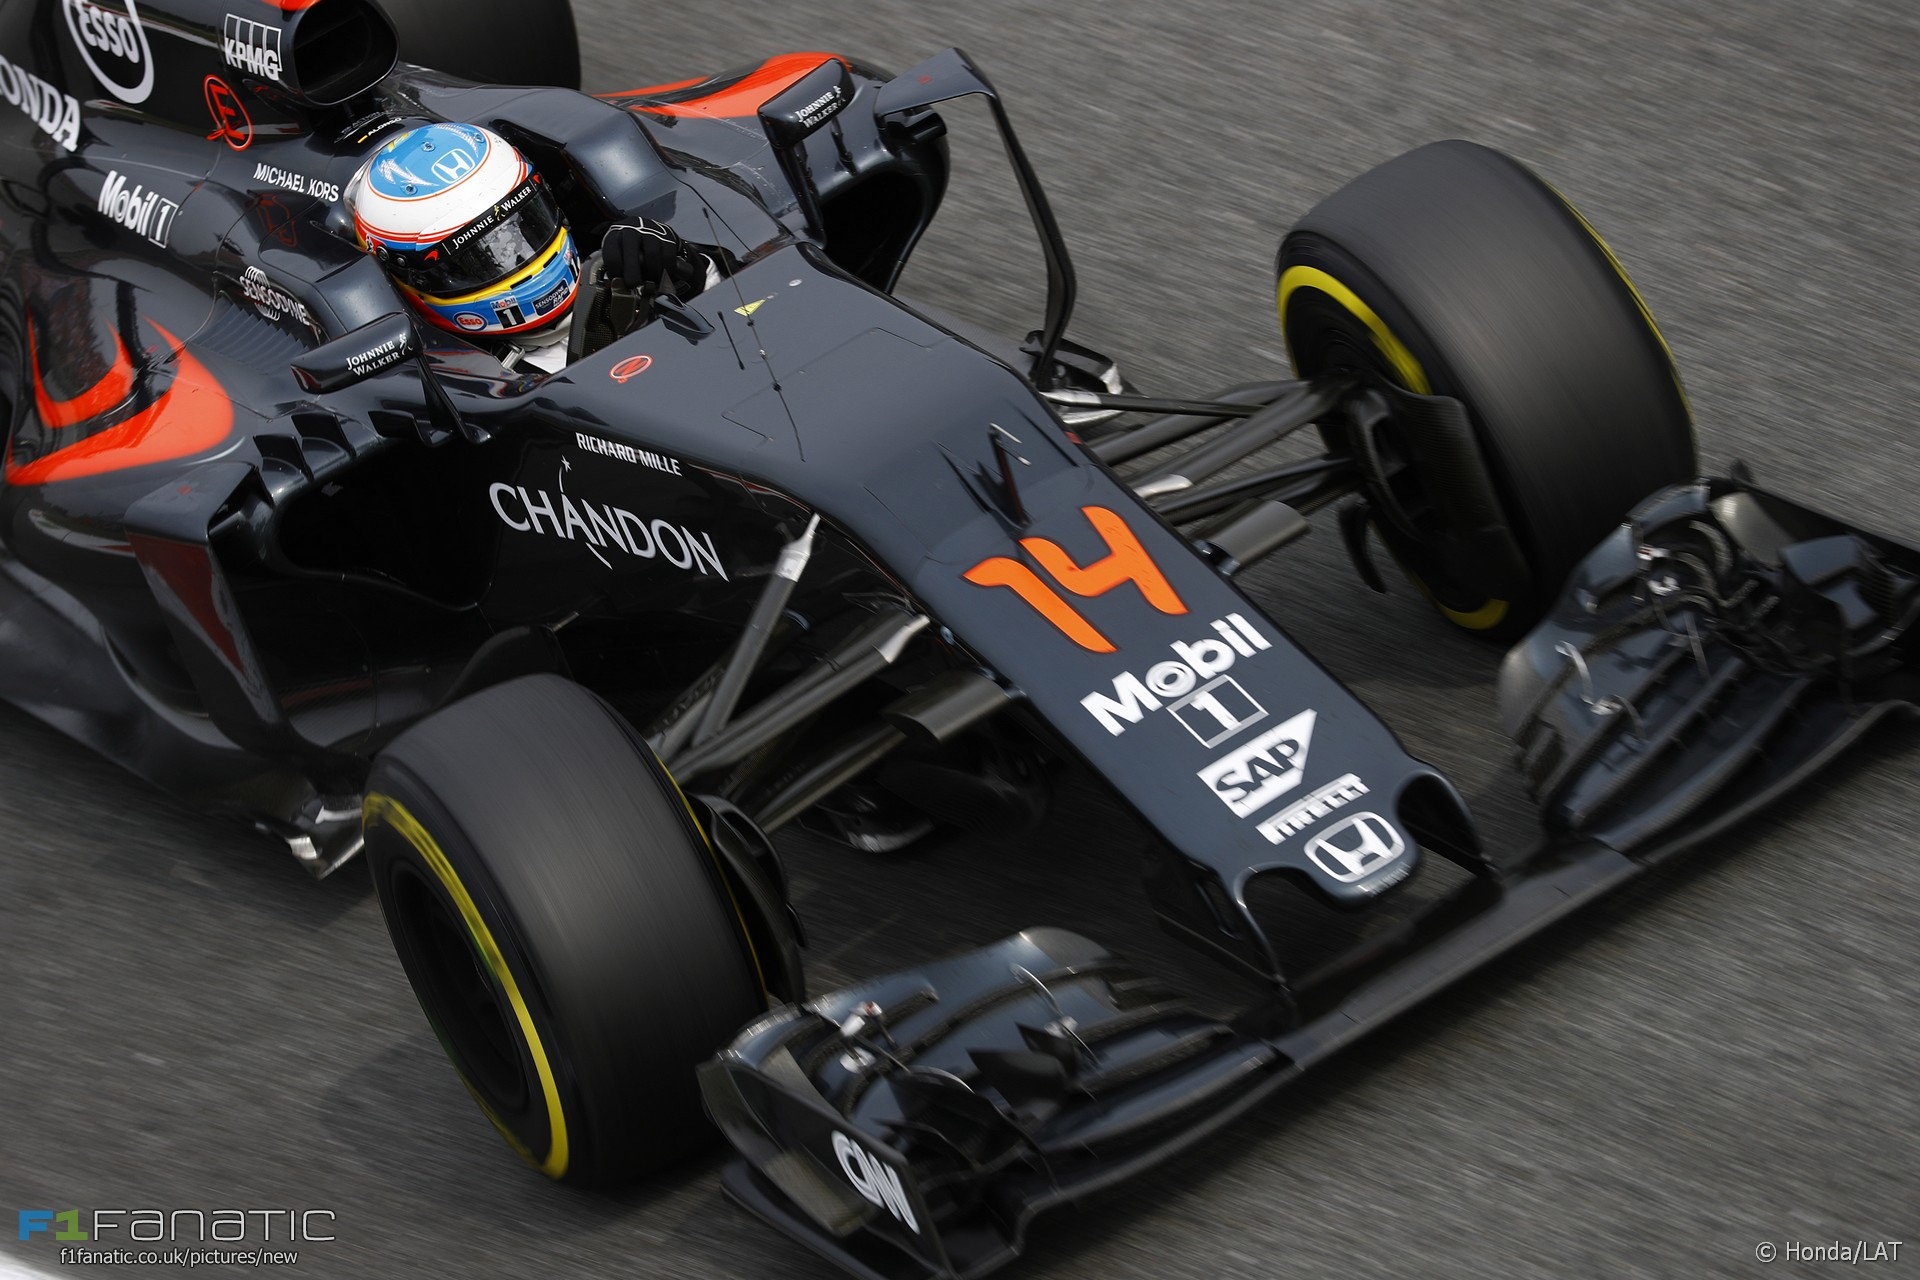 Fernando Alonso, McLaren, Monza, 2016